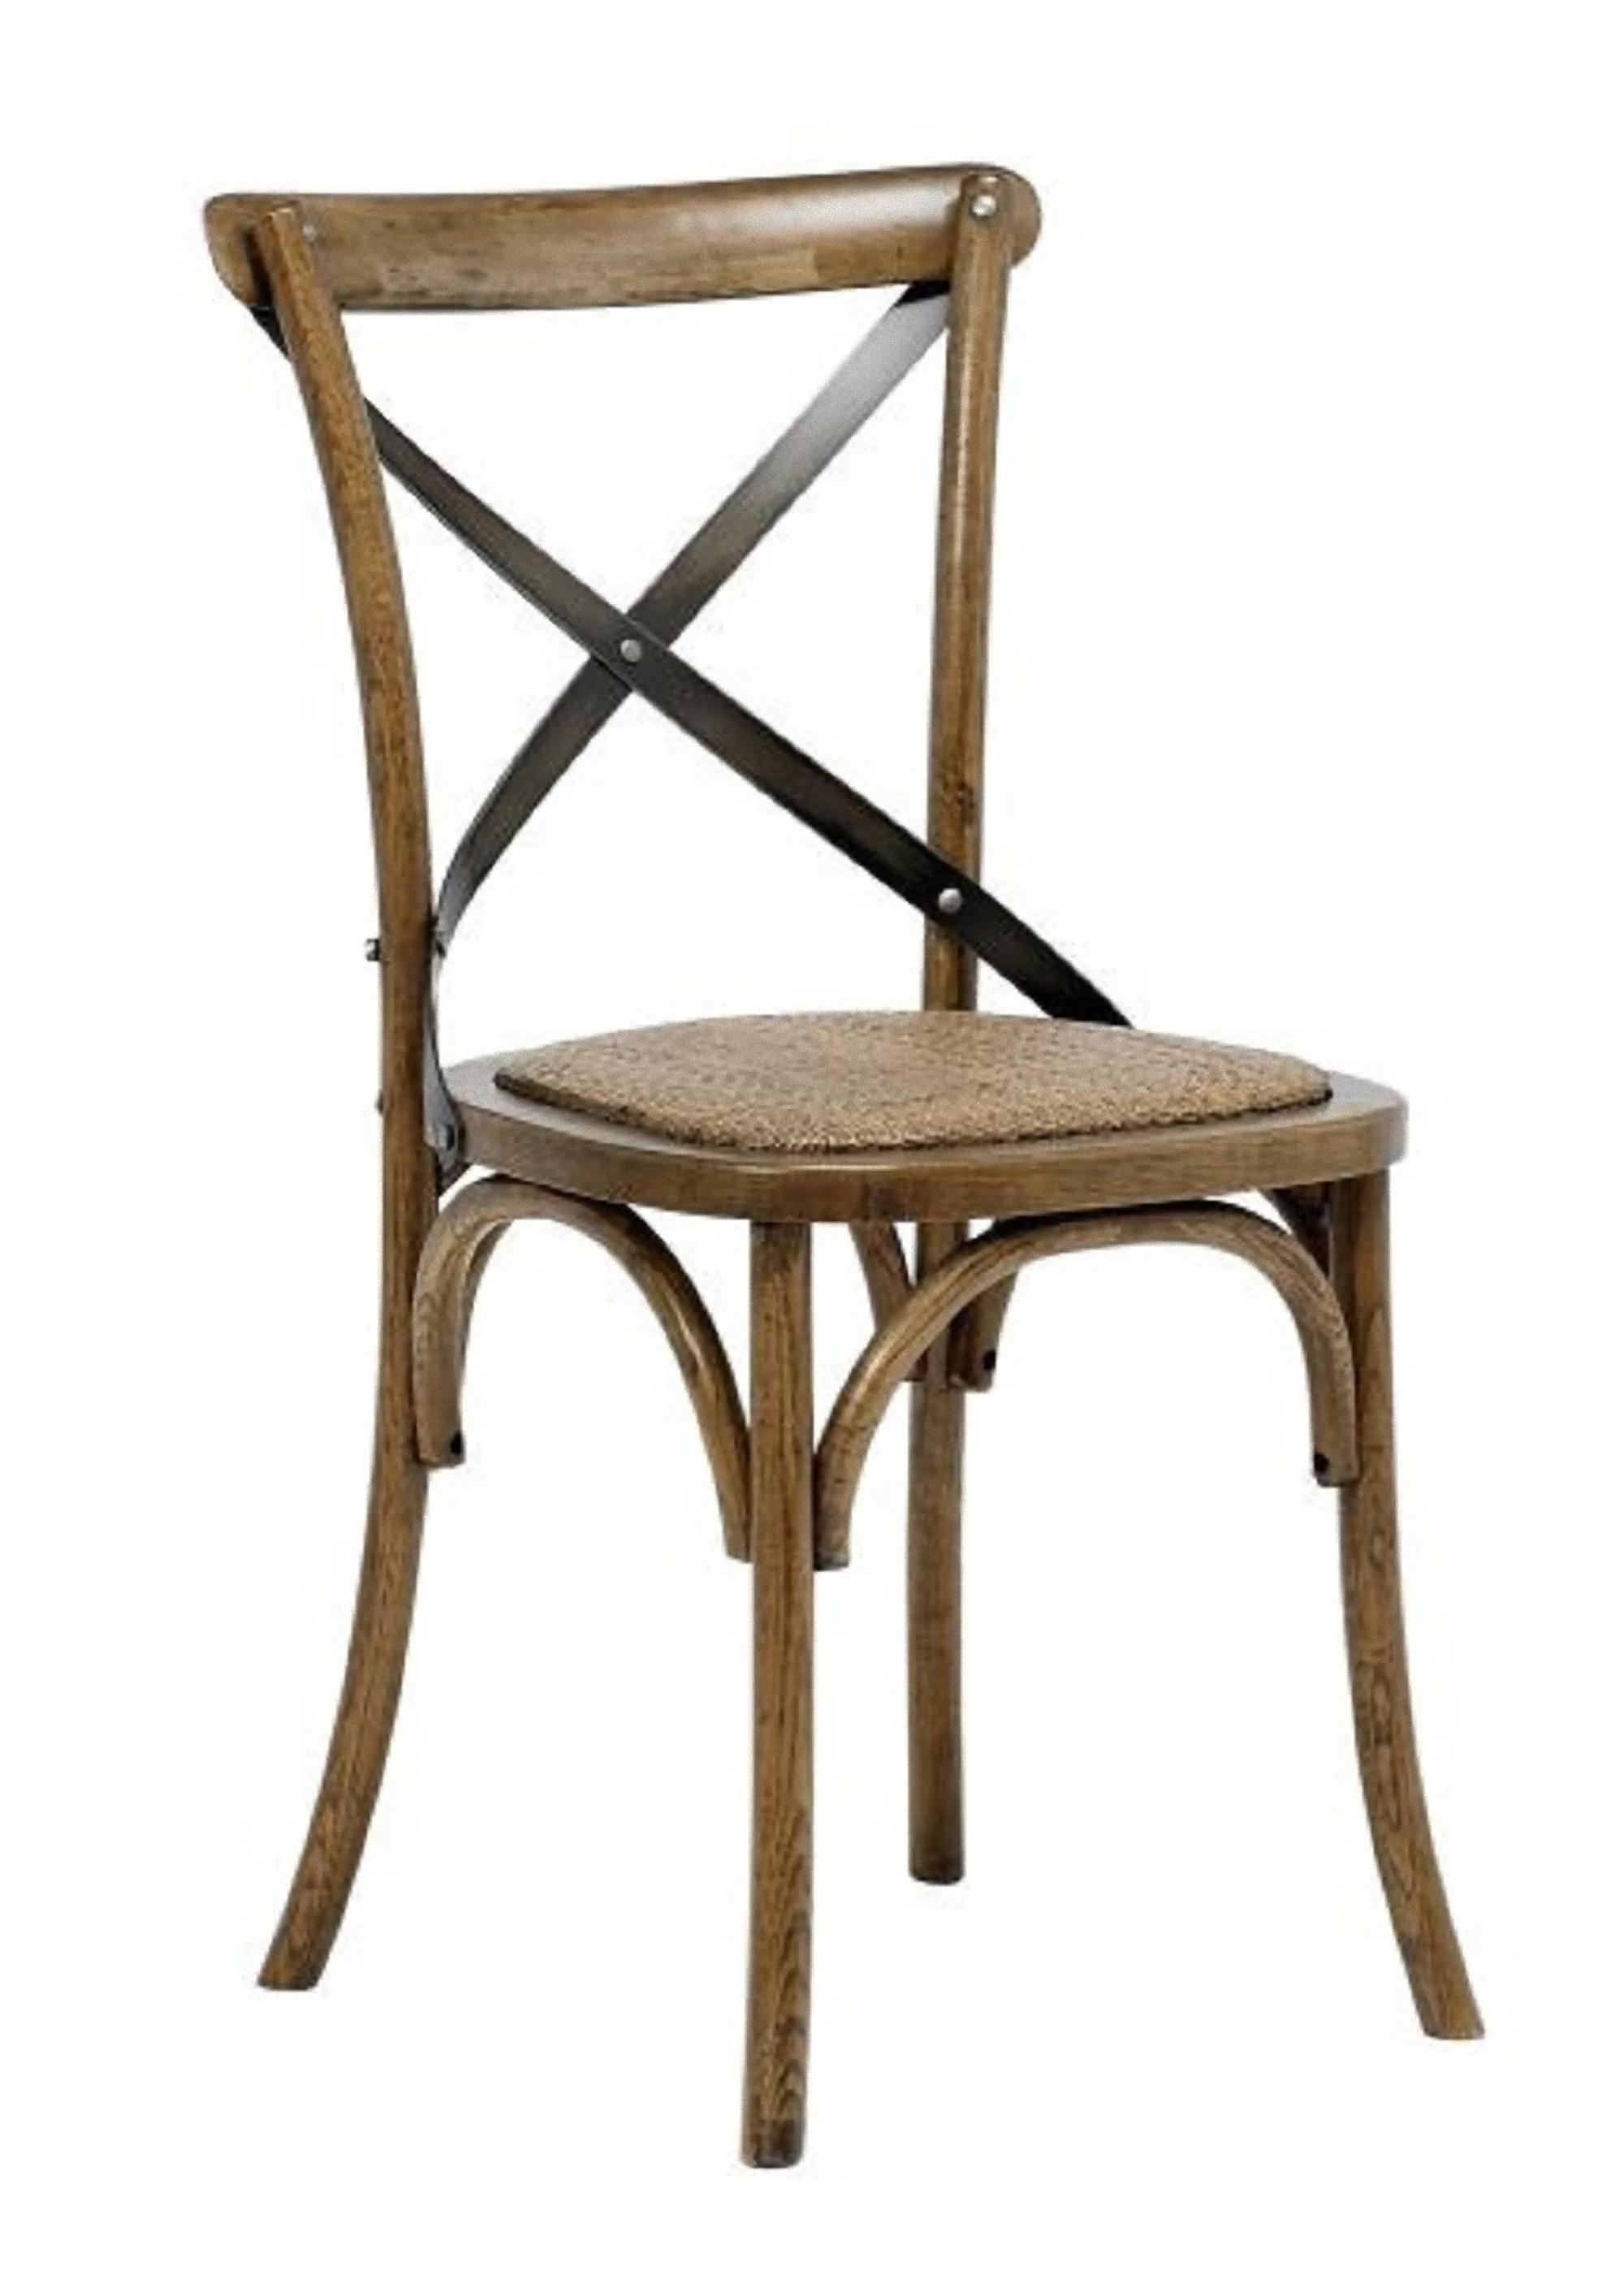 2er Set Retro Esszimmerstuhl Viby Stuhlset Holz Stuhl Stuhle Rattan Braun Dynamic 24 De